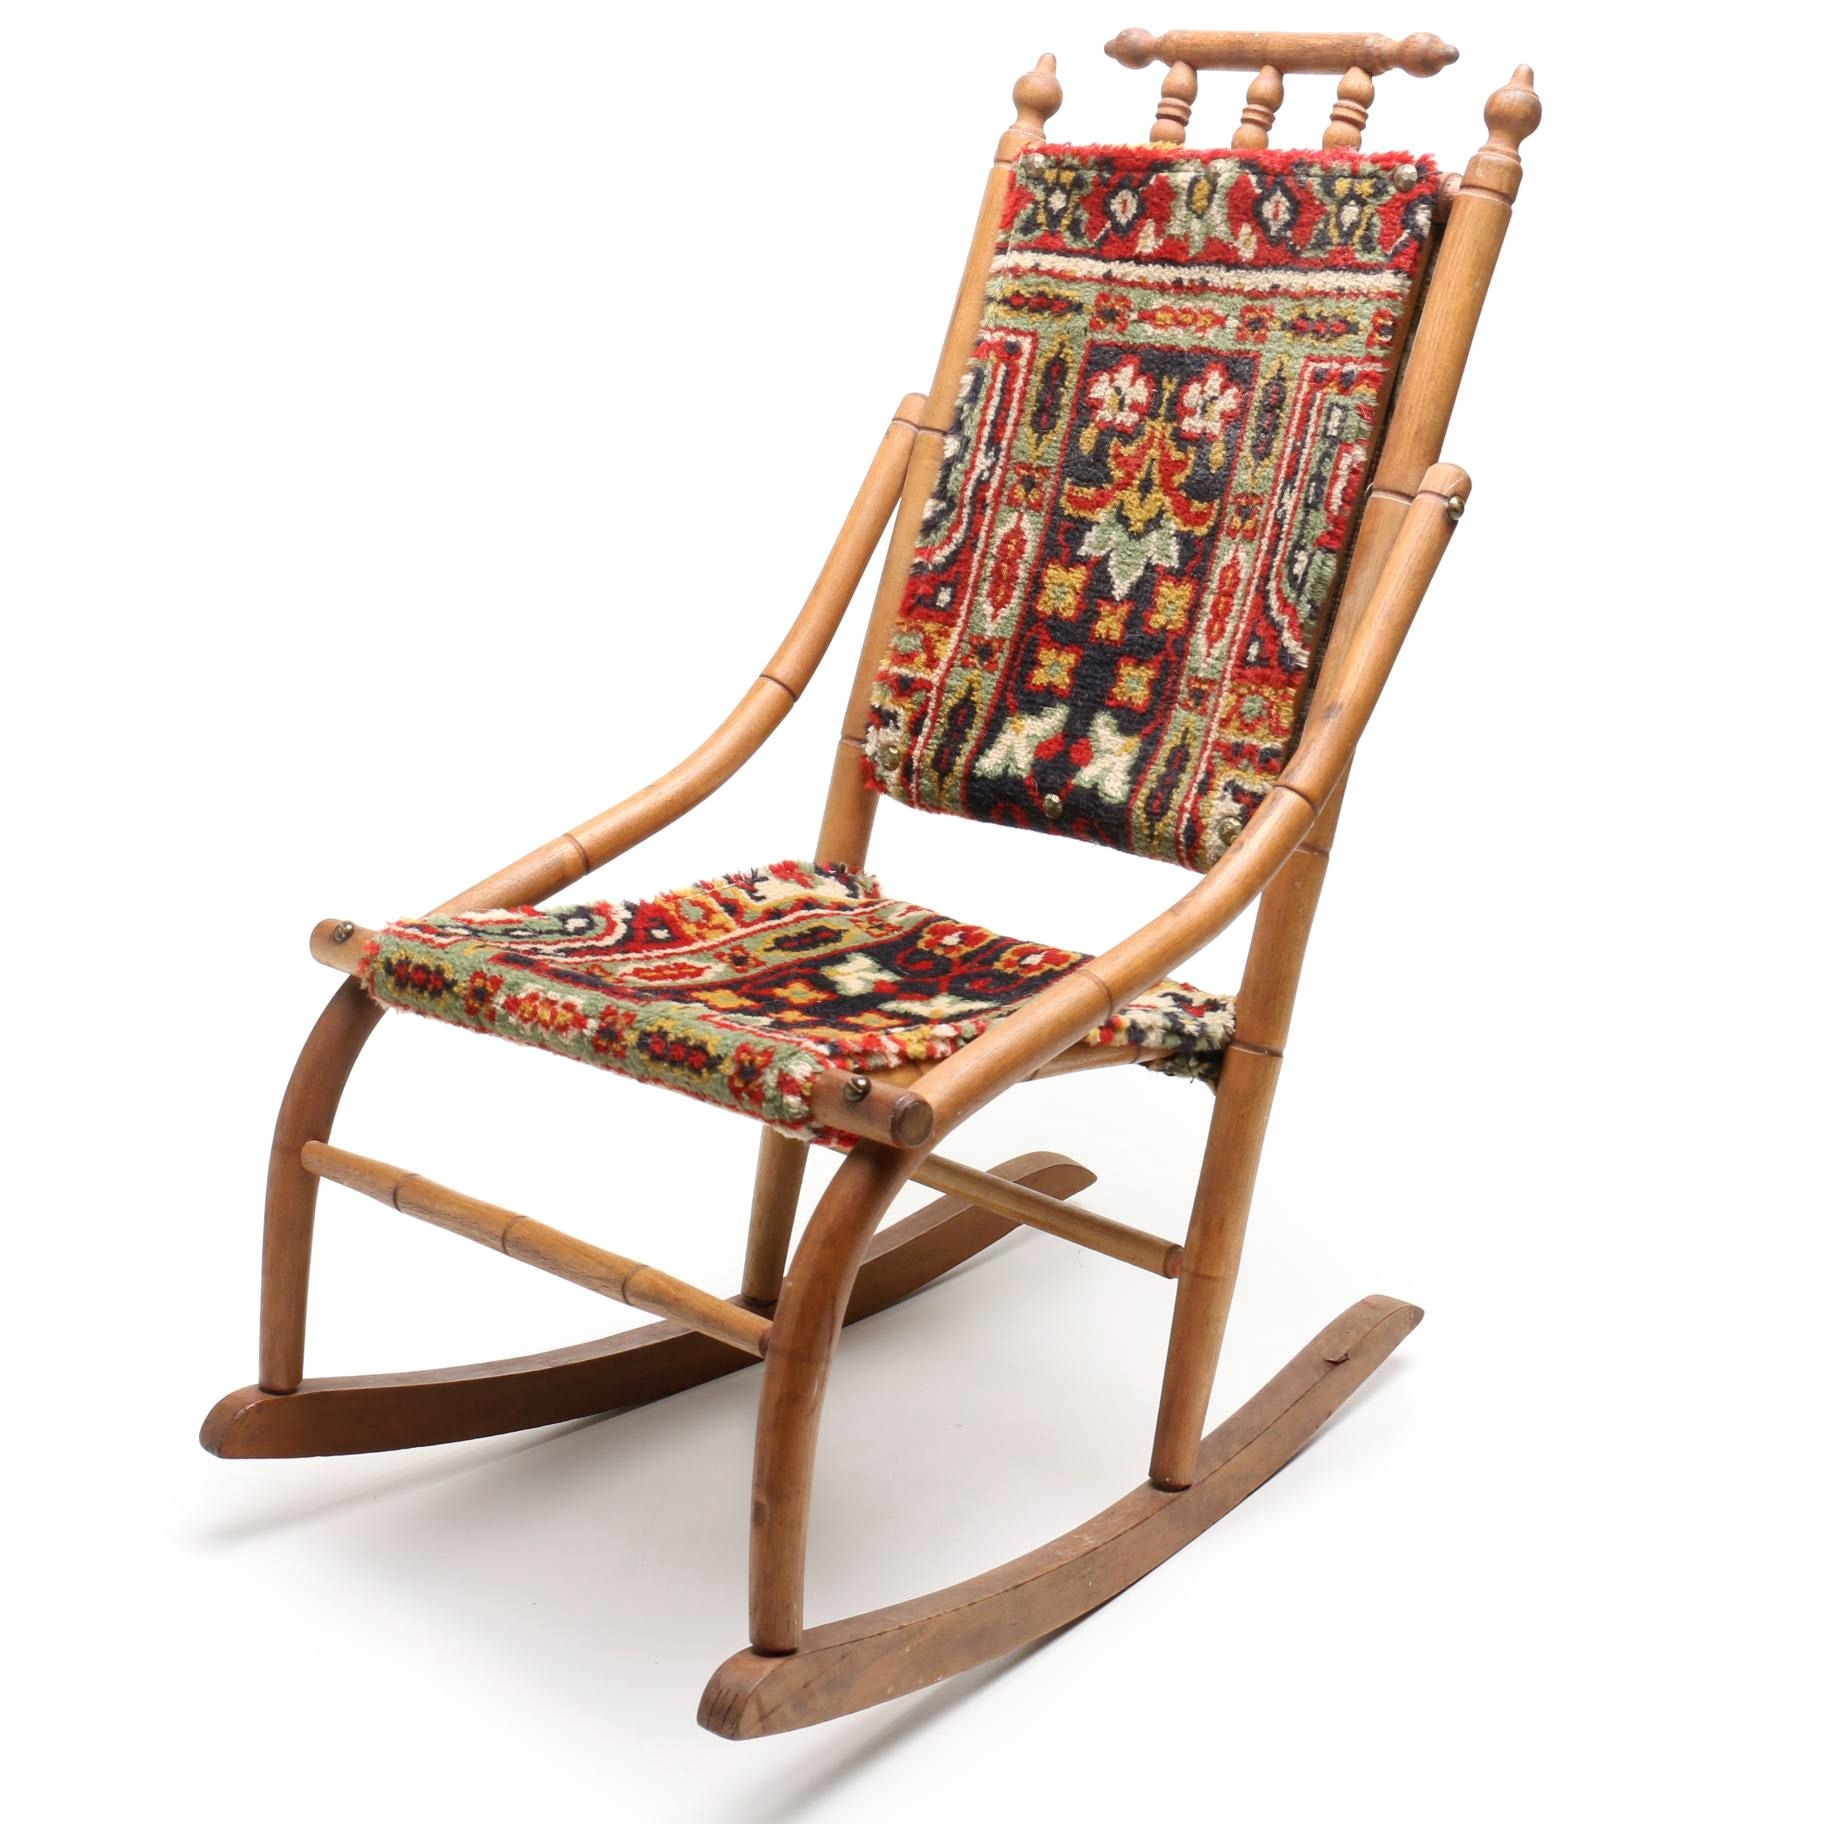 Ca. 1880s Child's Rocking Chair